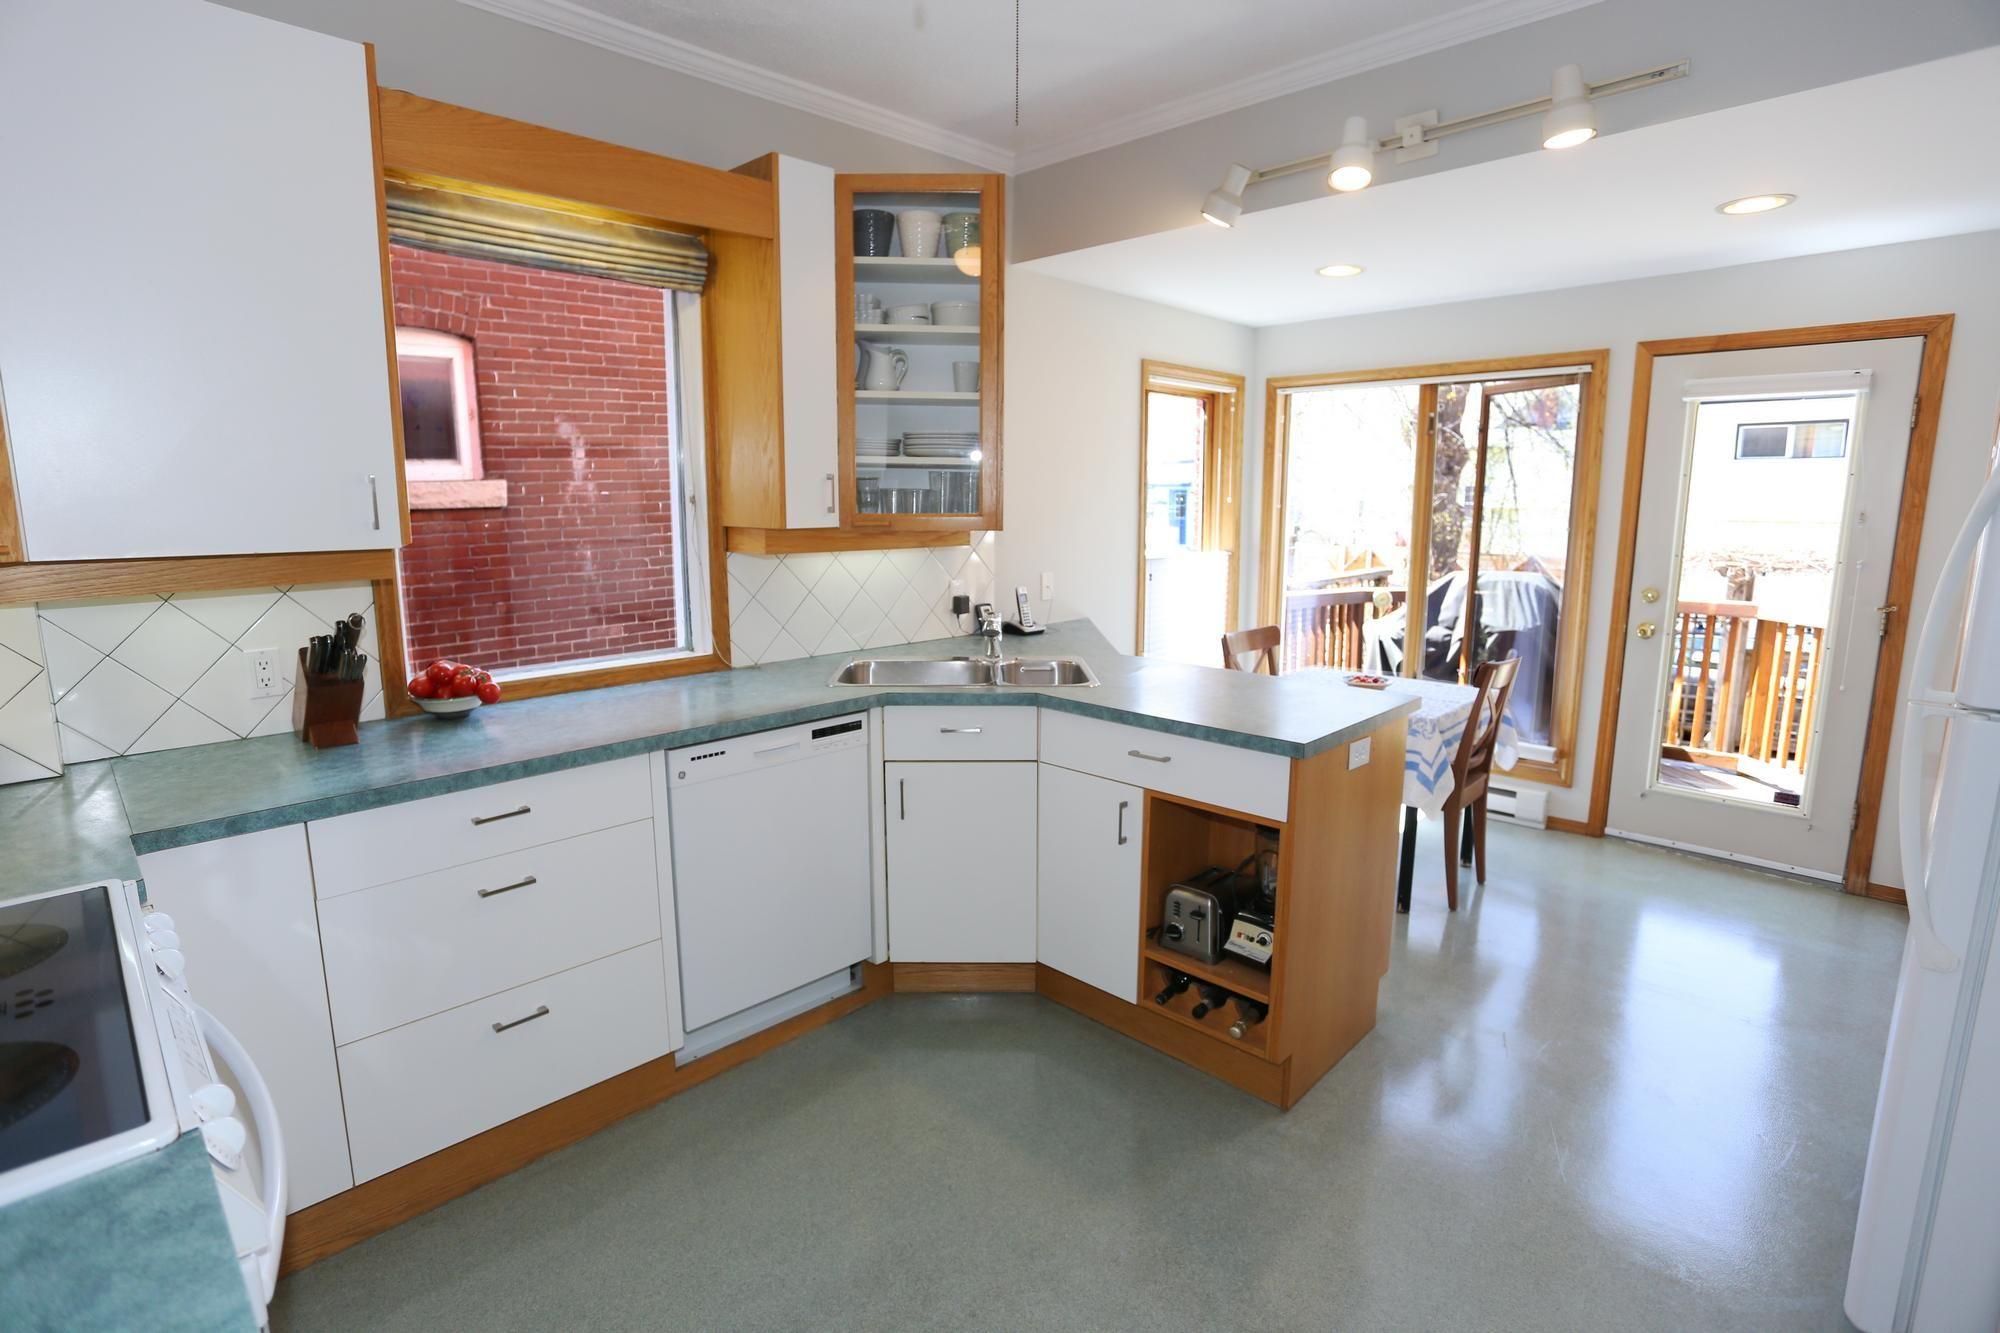 Photo 10: Photos: 96 Home Street in Winnipeg: Wolseley Single Family Detached for sale (5B)  : MLS®# 1810985